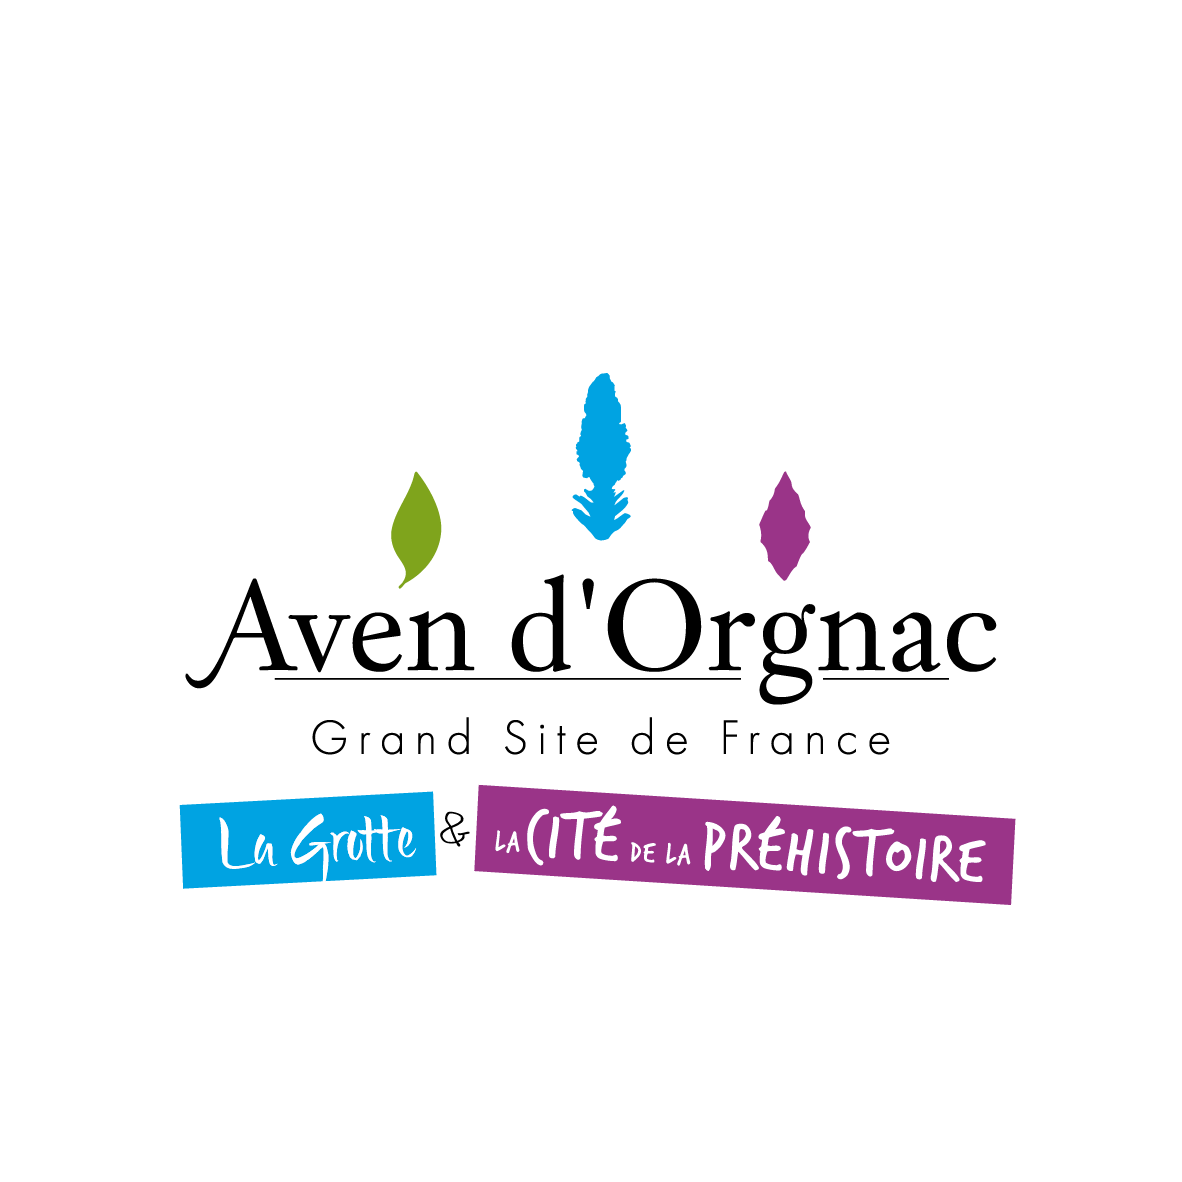 Grand site de l'Aven d'Orgnac